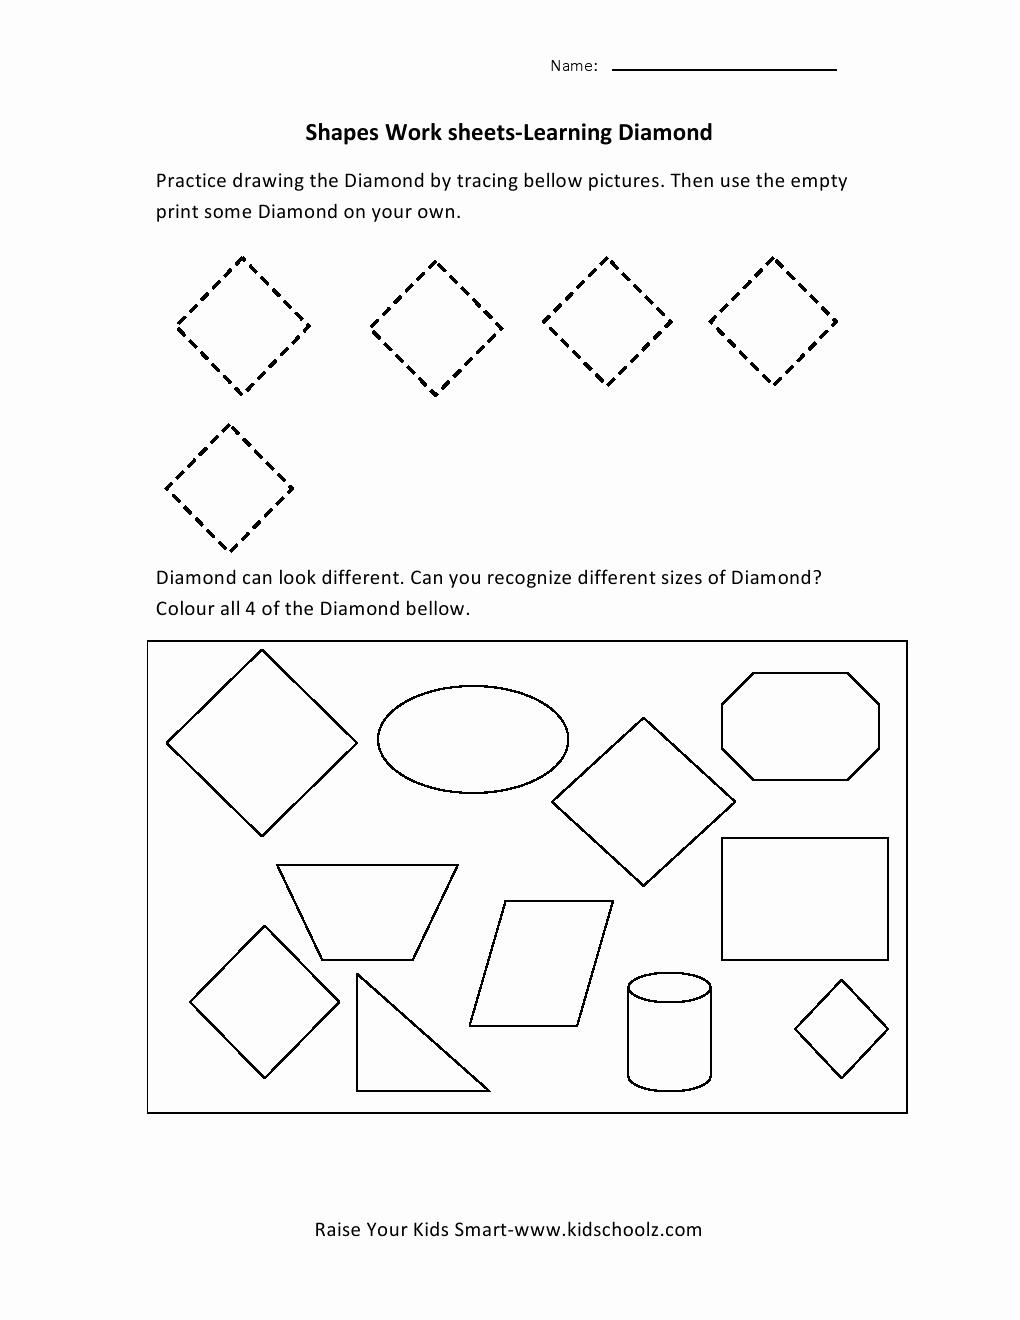 Preschool Diamond Shape Worksheets Lovely 8 Best Of Diamond Worksheets for Preschoolers